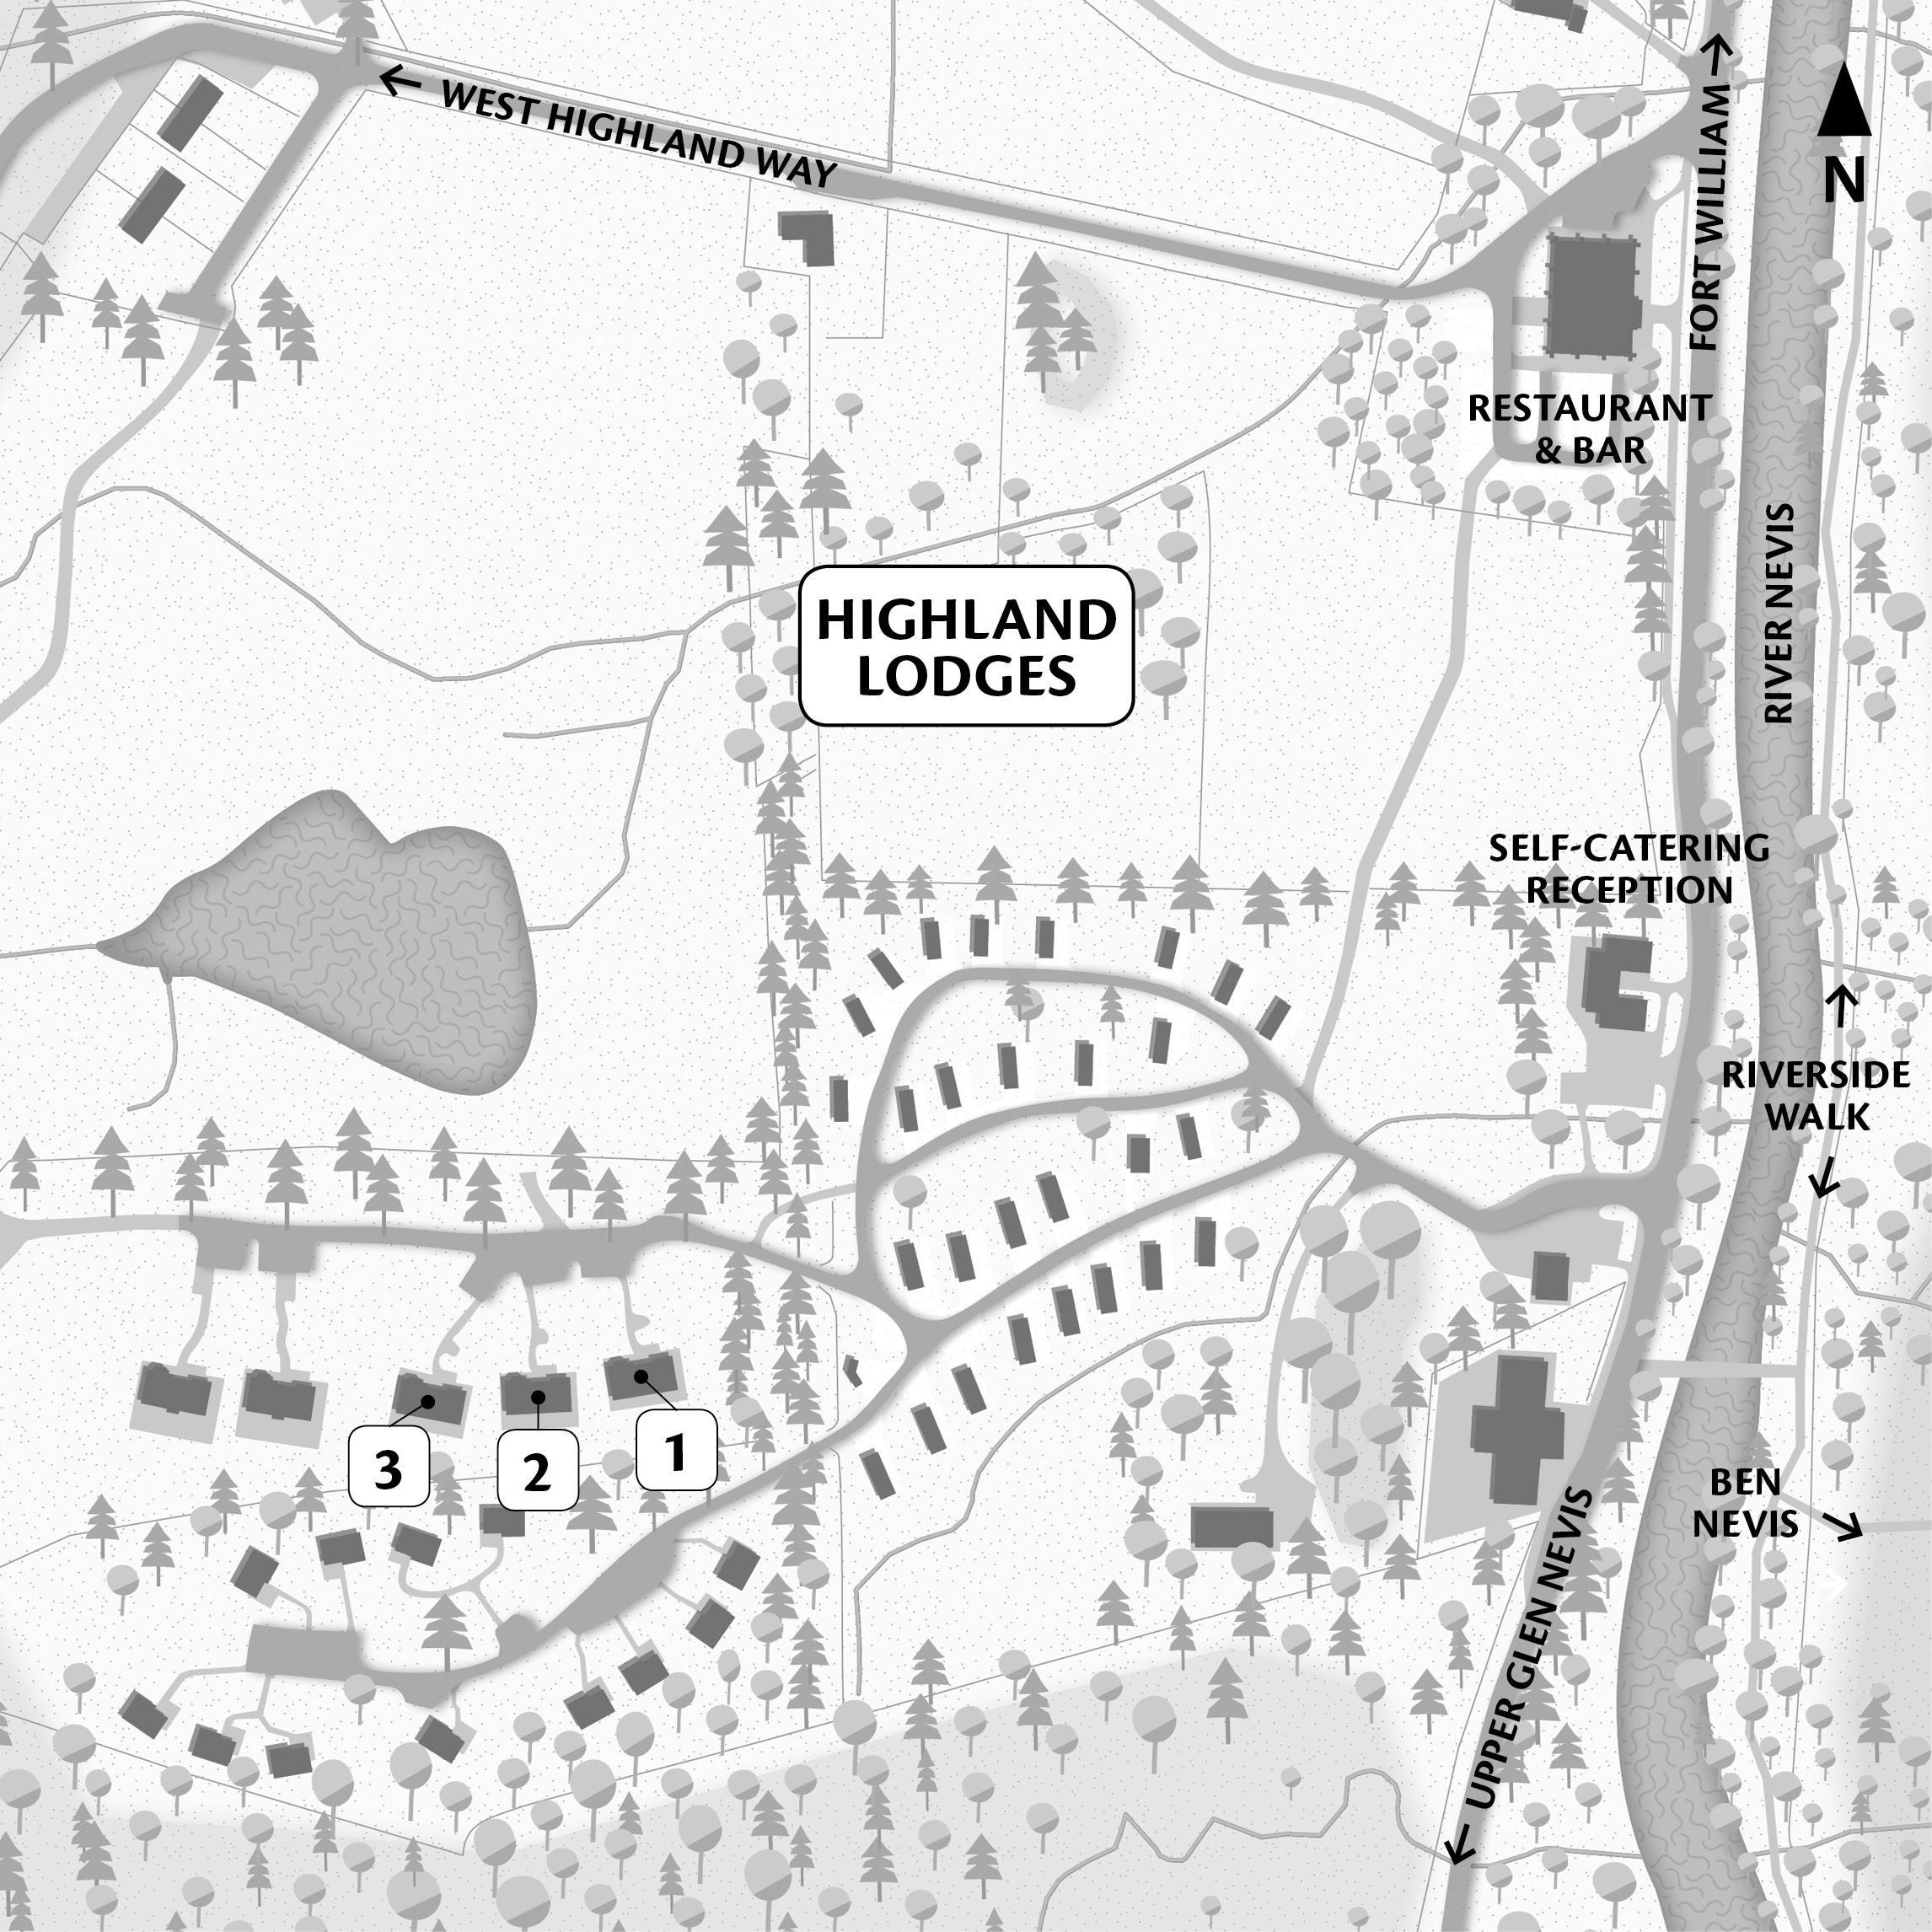 GNH-Map-SelfCatering-WebUnits-HighlandLodges.jpg